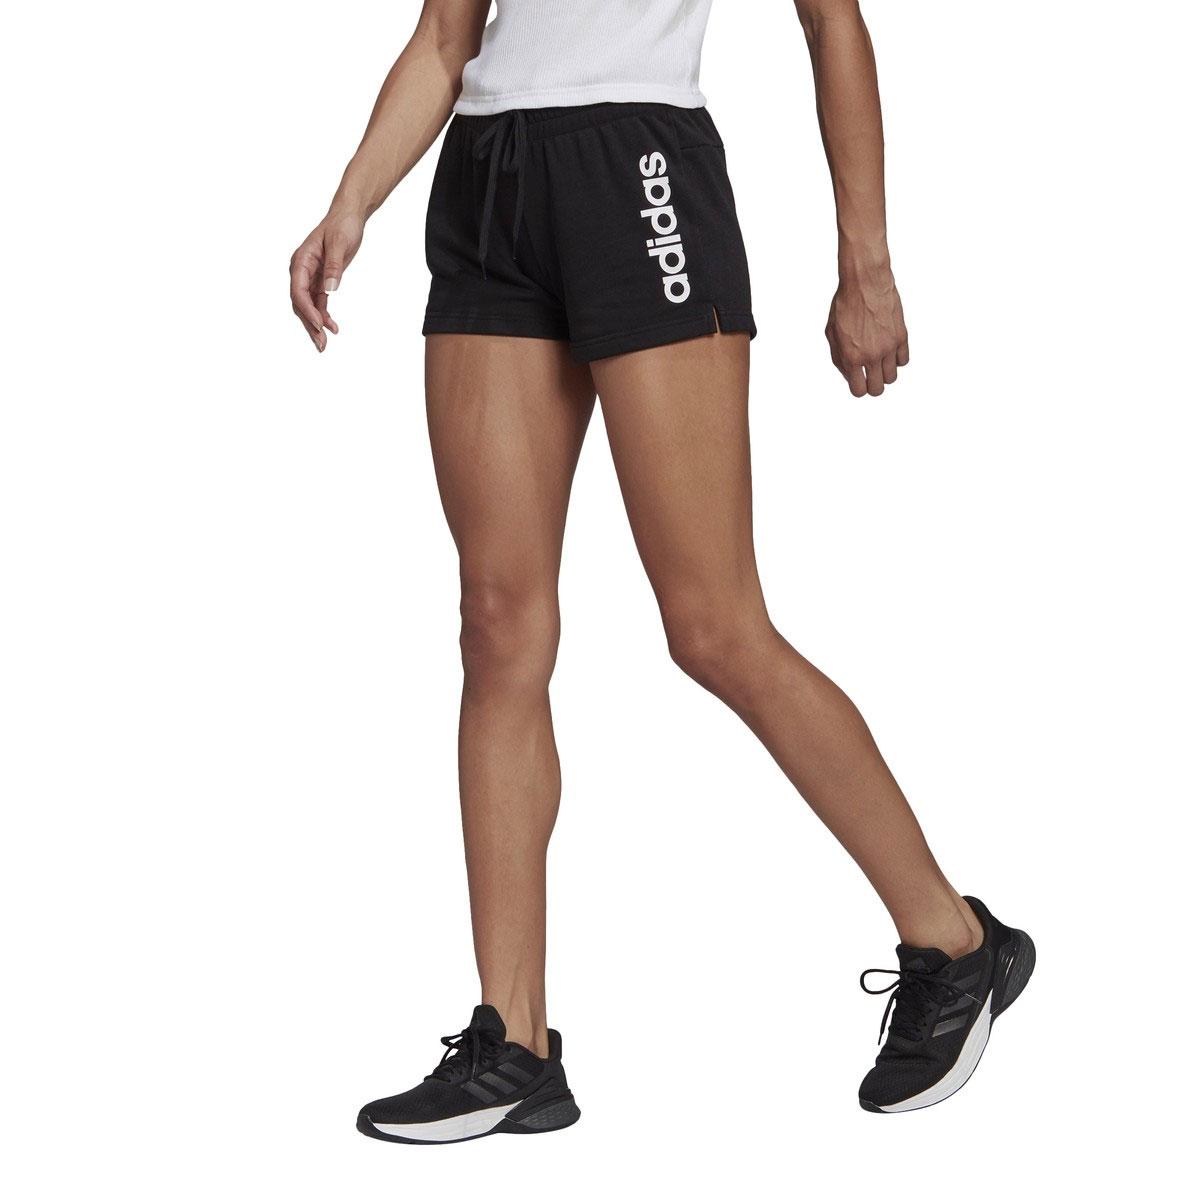 Women's Linear Shorts, Black/White, swatch